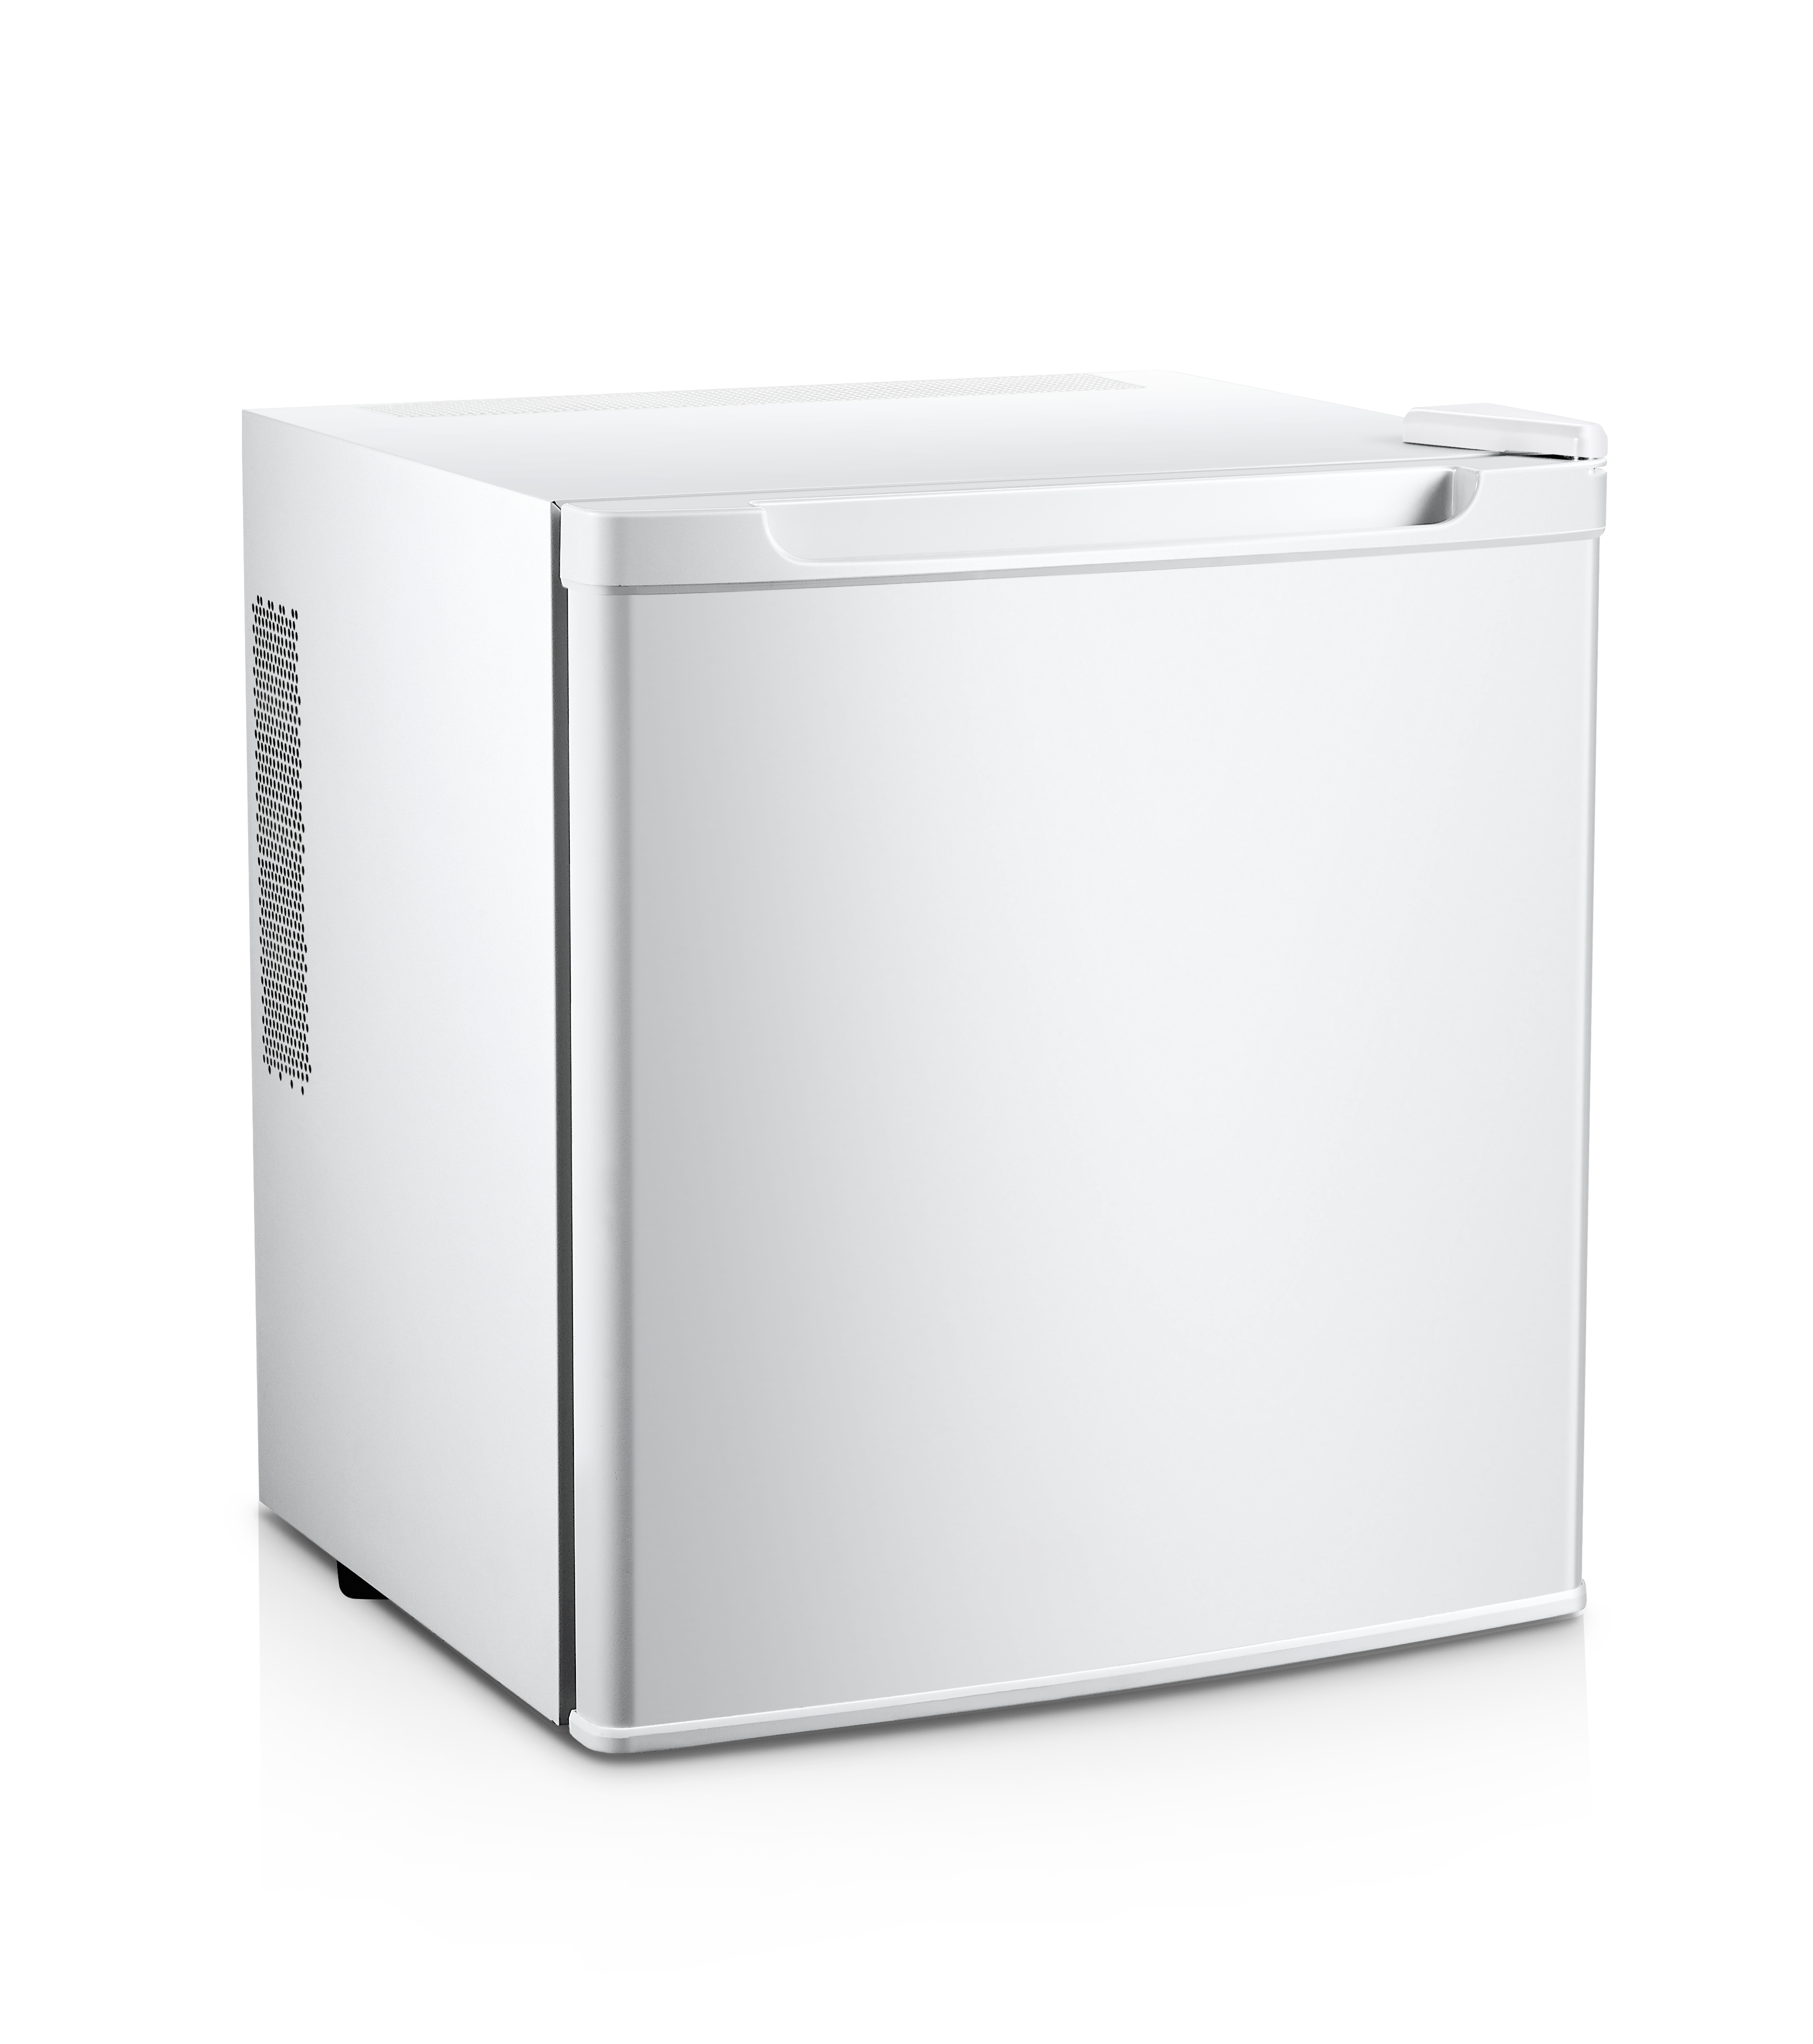 静音冰箱BC-30D